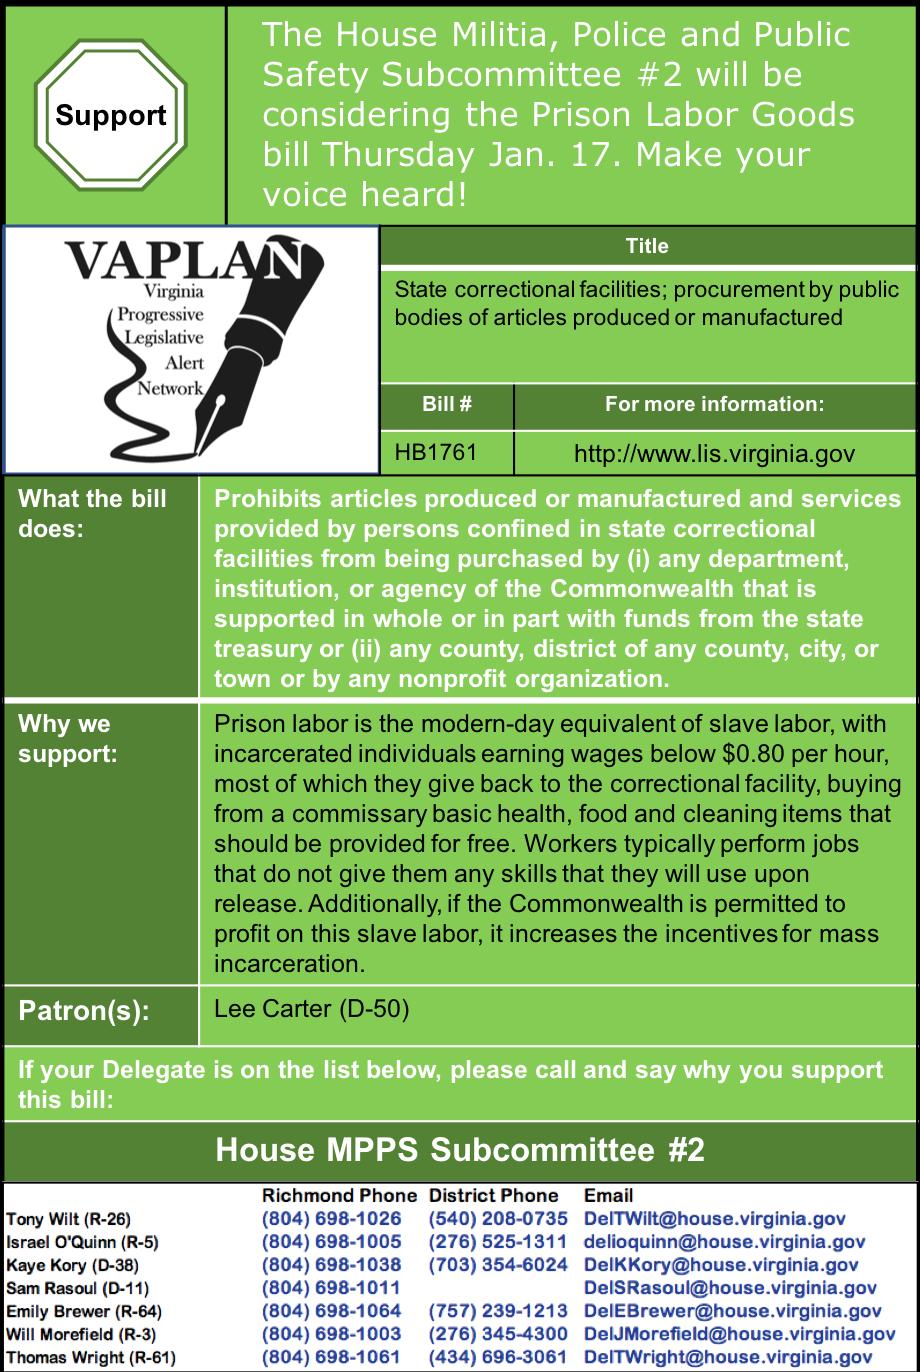 ALERT: Stop Using Prison Labor, House MPPS #2 Thursday Jan. 17